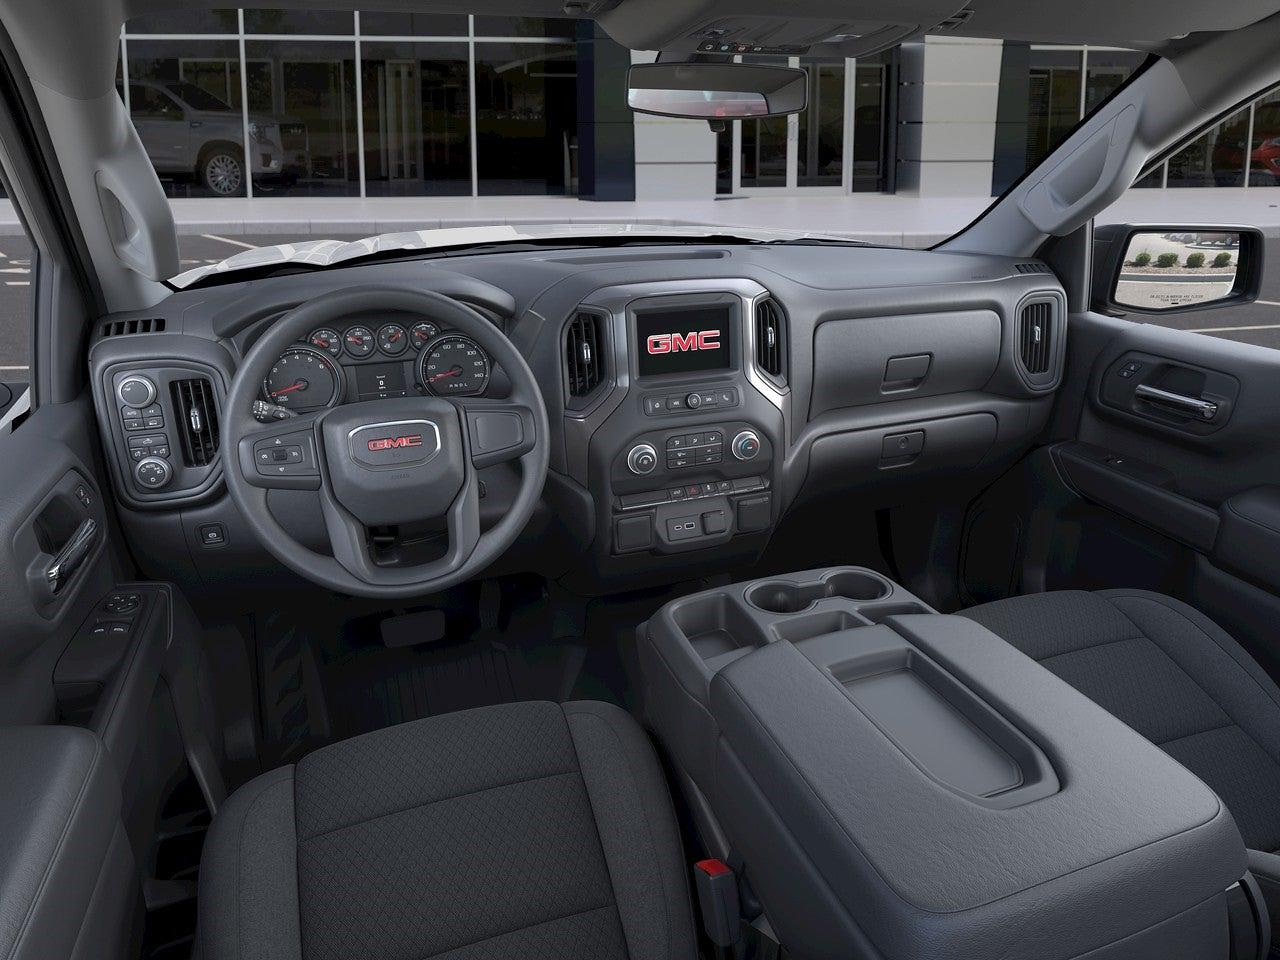 2021 GMC Sierra 1500 Regular Cab 4x4, Pickup #V21207 - photo 12